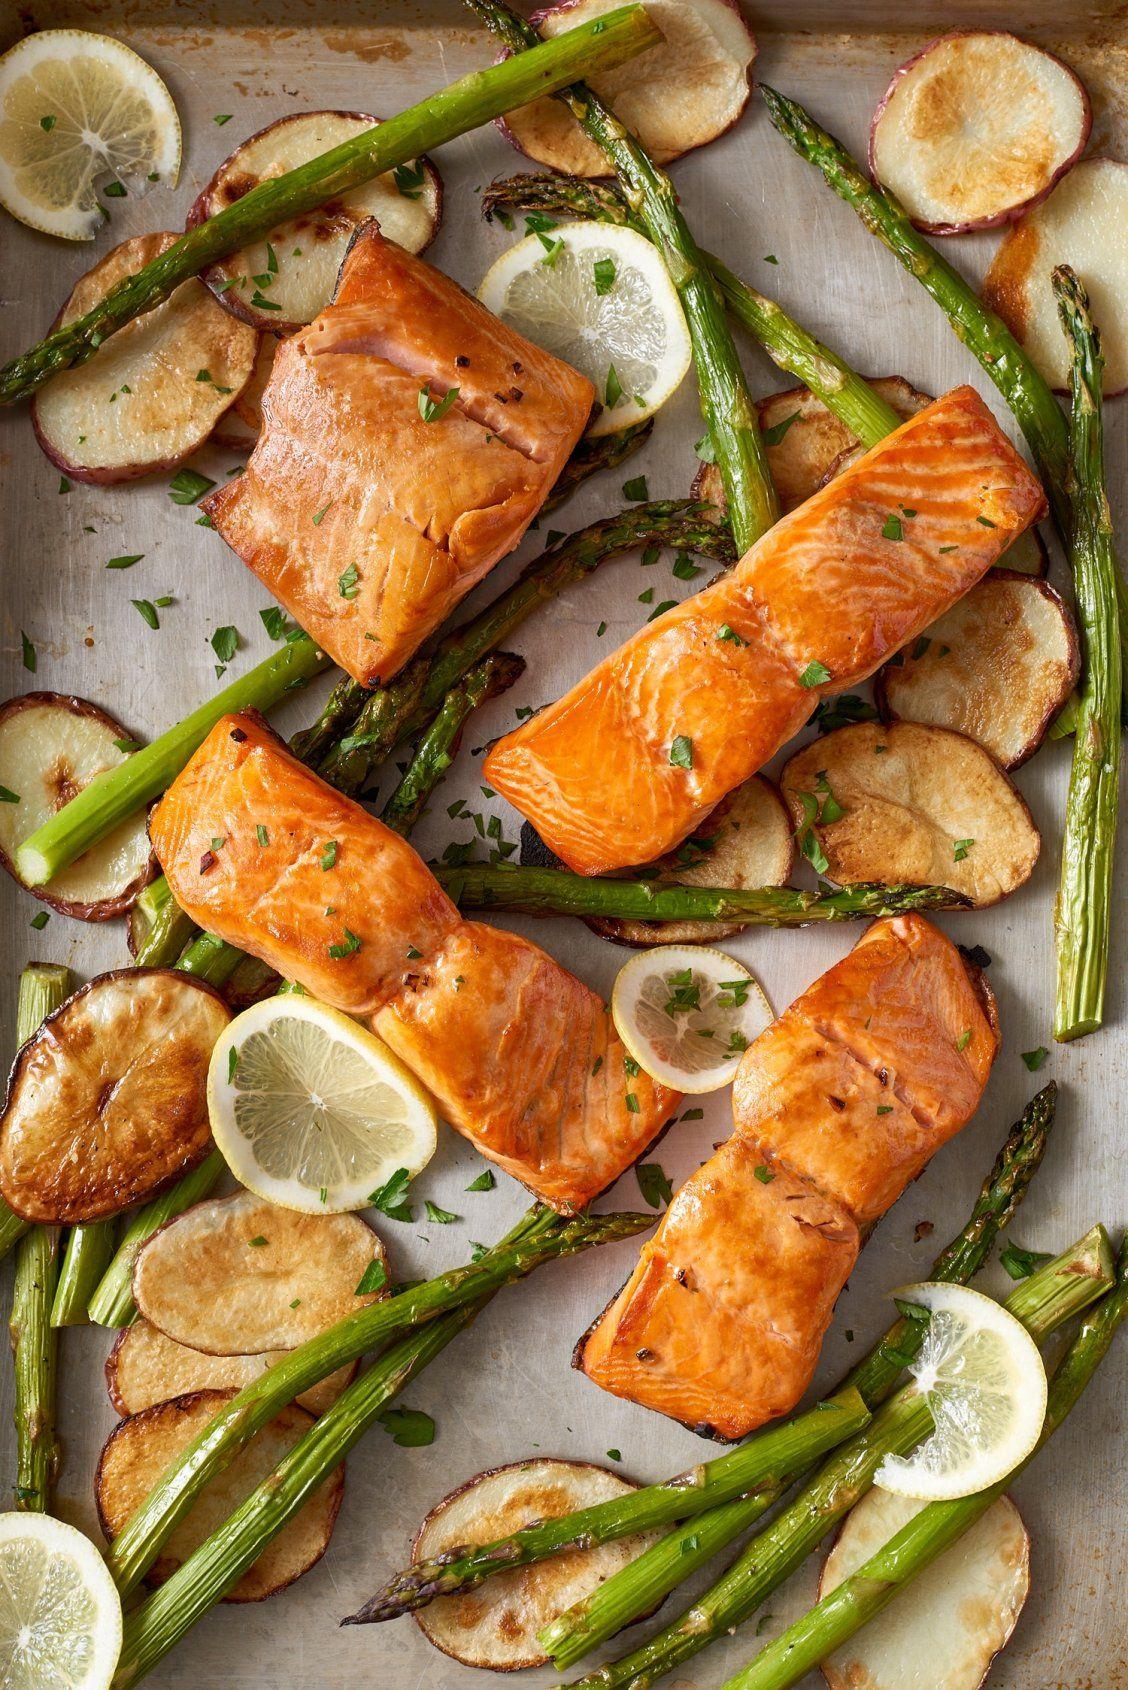 Recipe: Sheet Pan Crispy Salmon and Potatoes